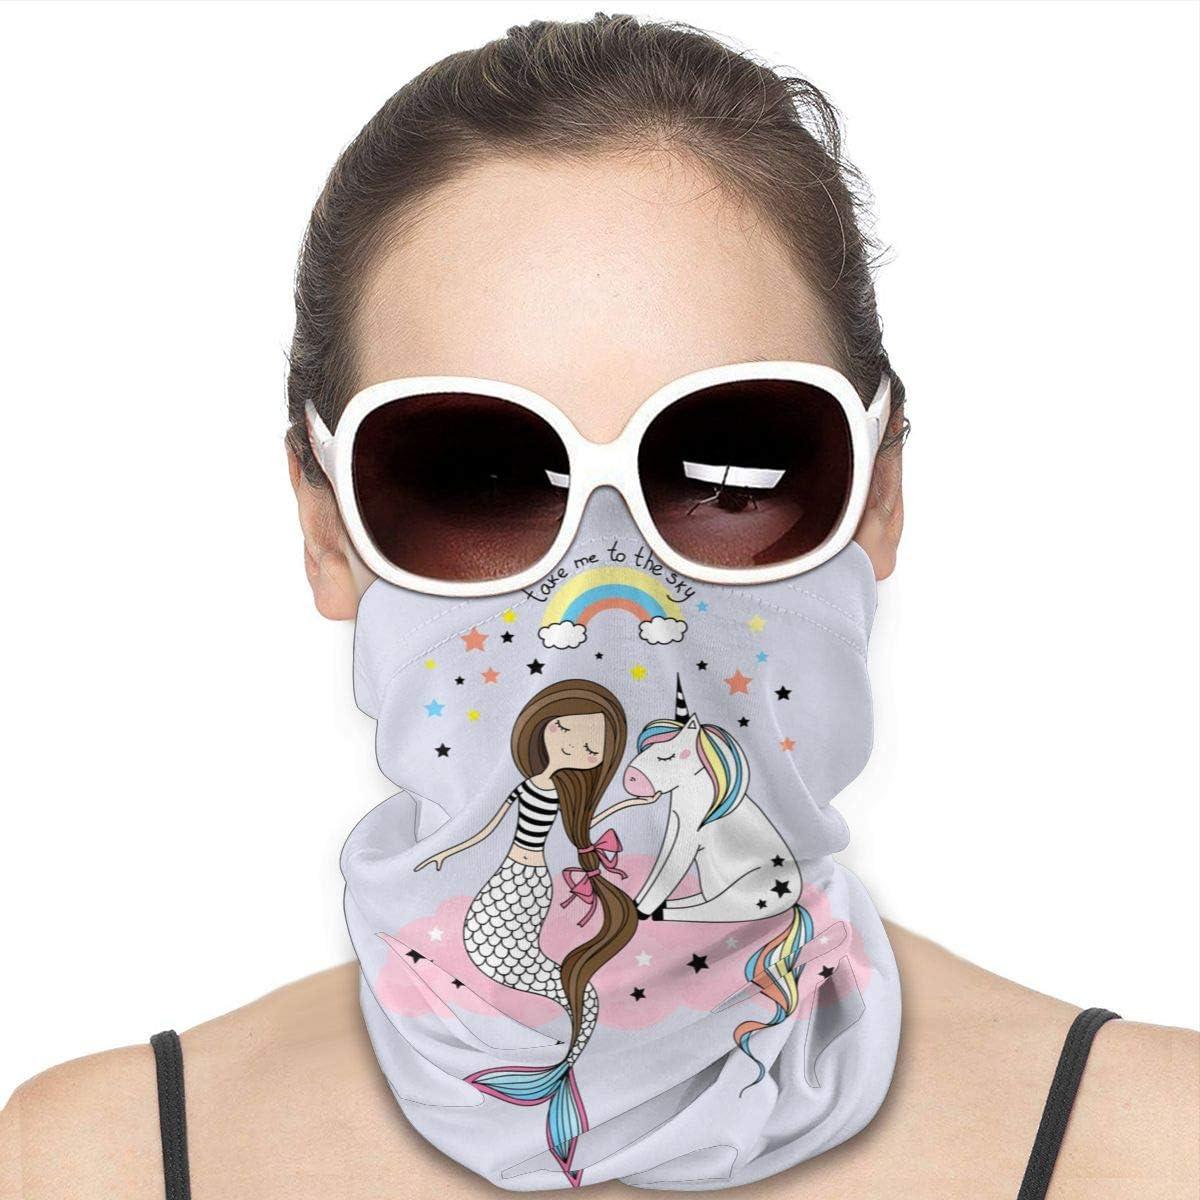 KiuLoam Women Bandanas Face Mask, Cute Mermaid Unicorn Neck Gaiter Mask Headband for Men Face Scarf Dust, Outdoors, Sports